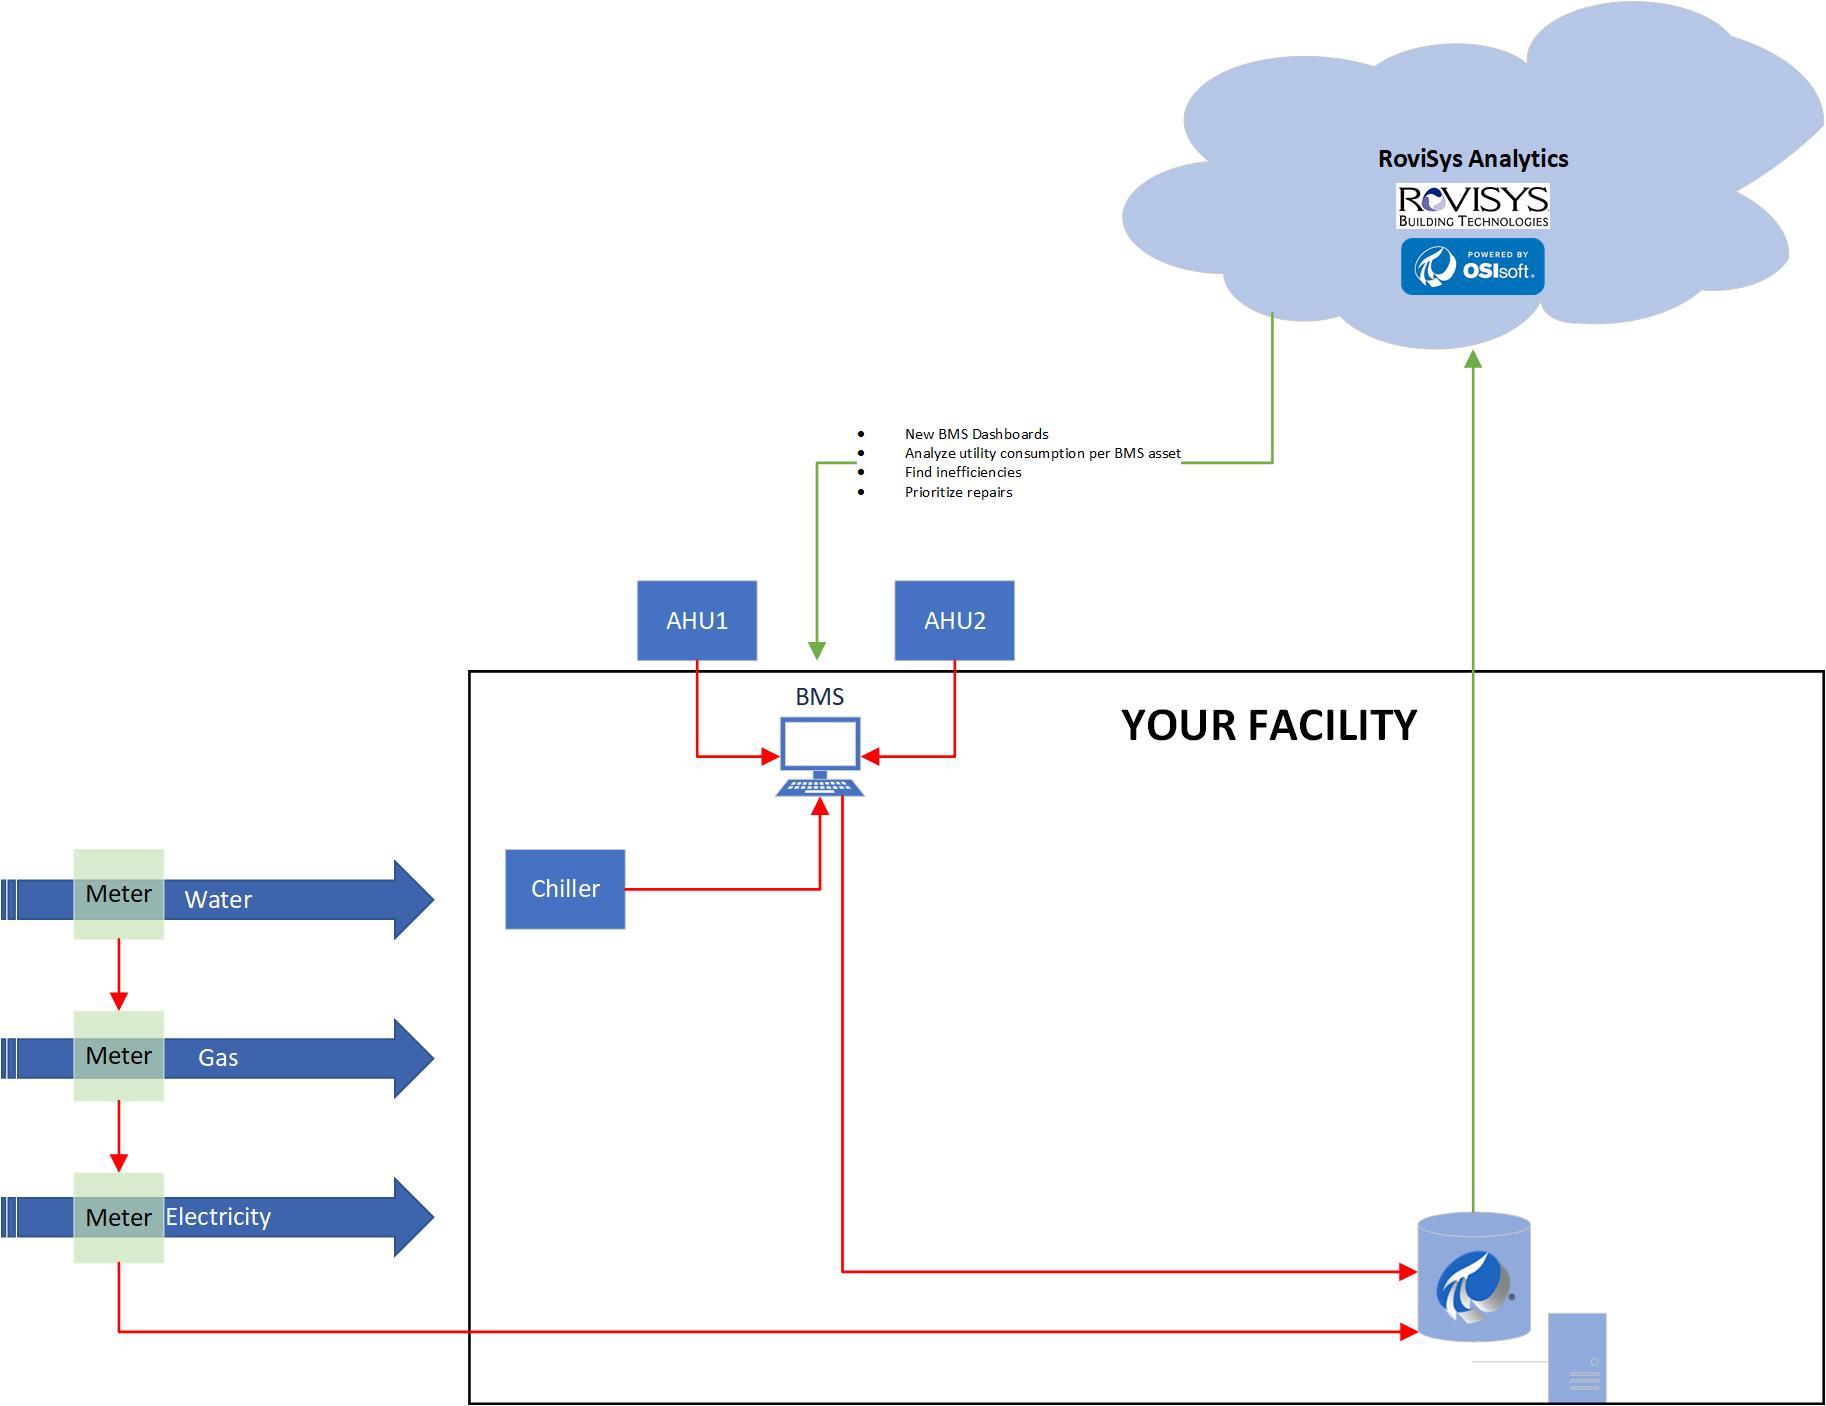 Understand Utility Consumption, Automate Equipment Maintenance